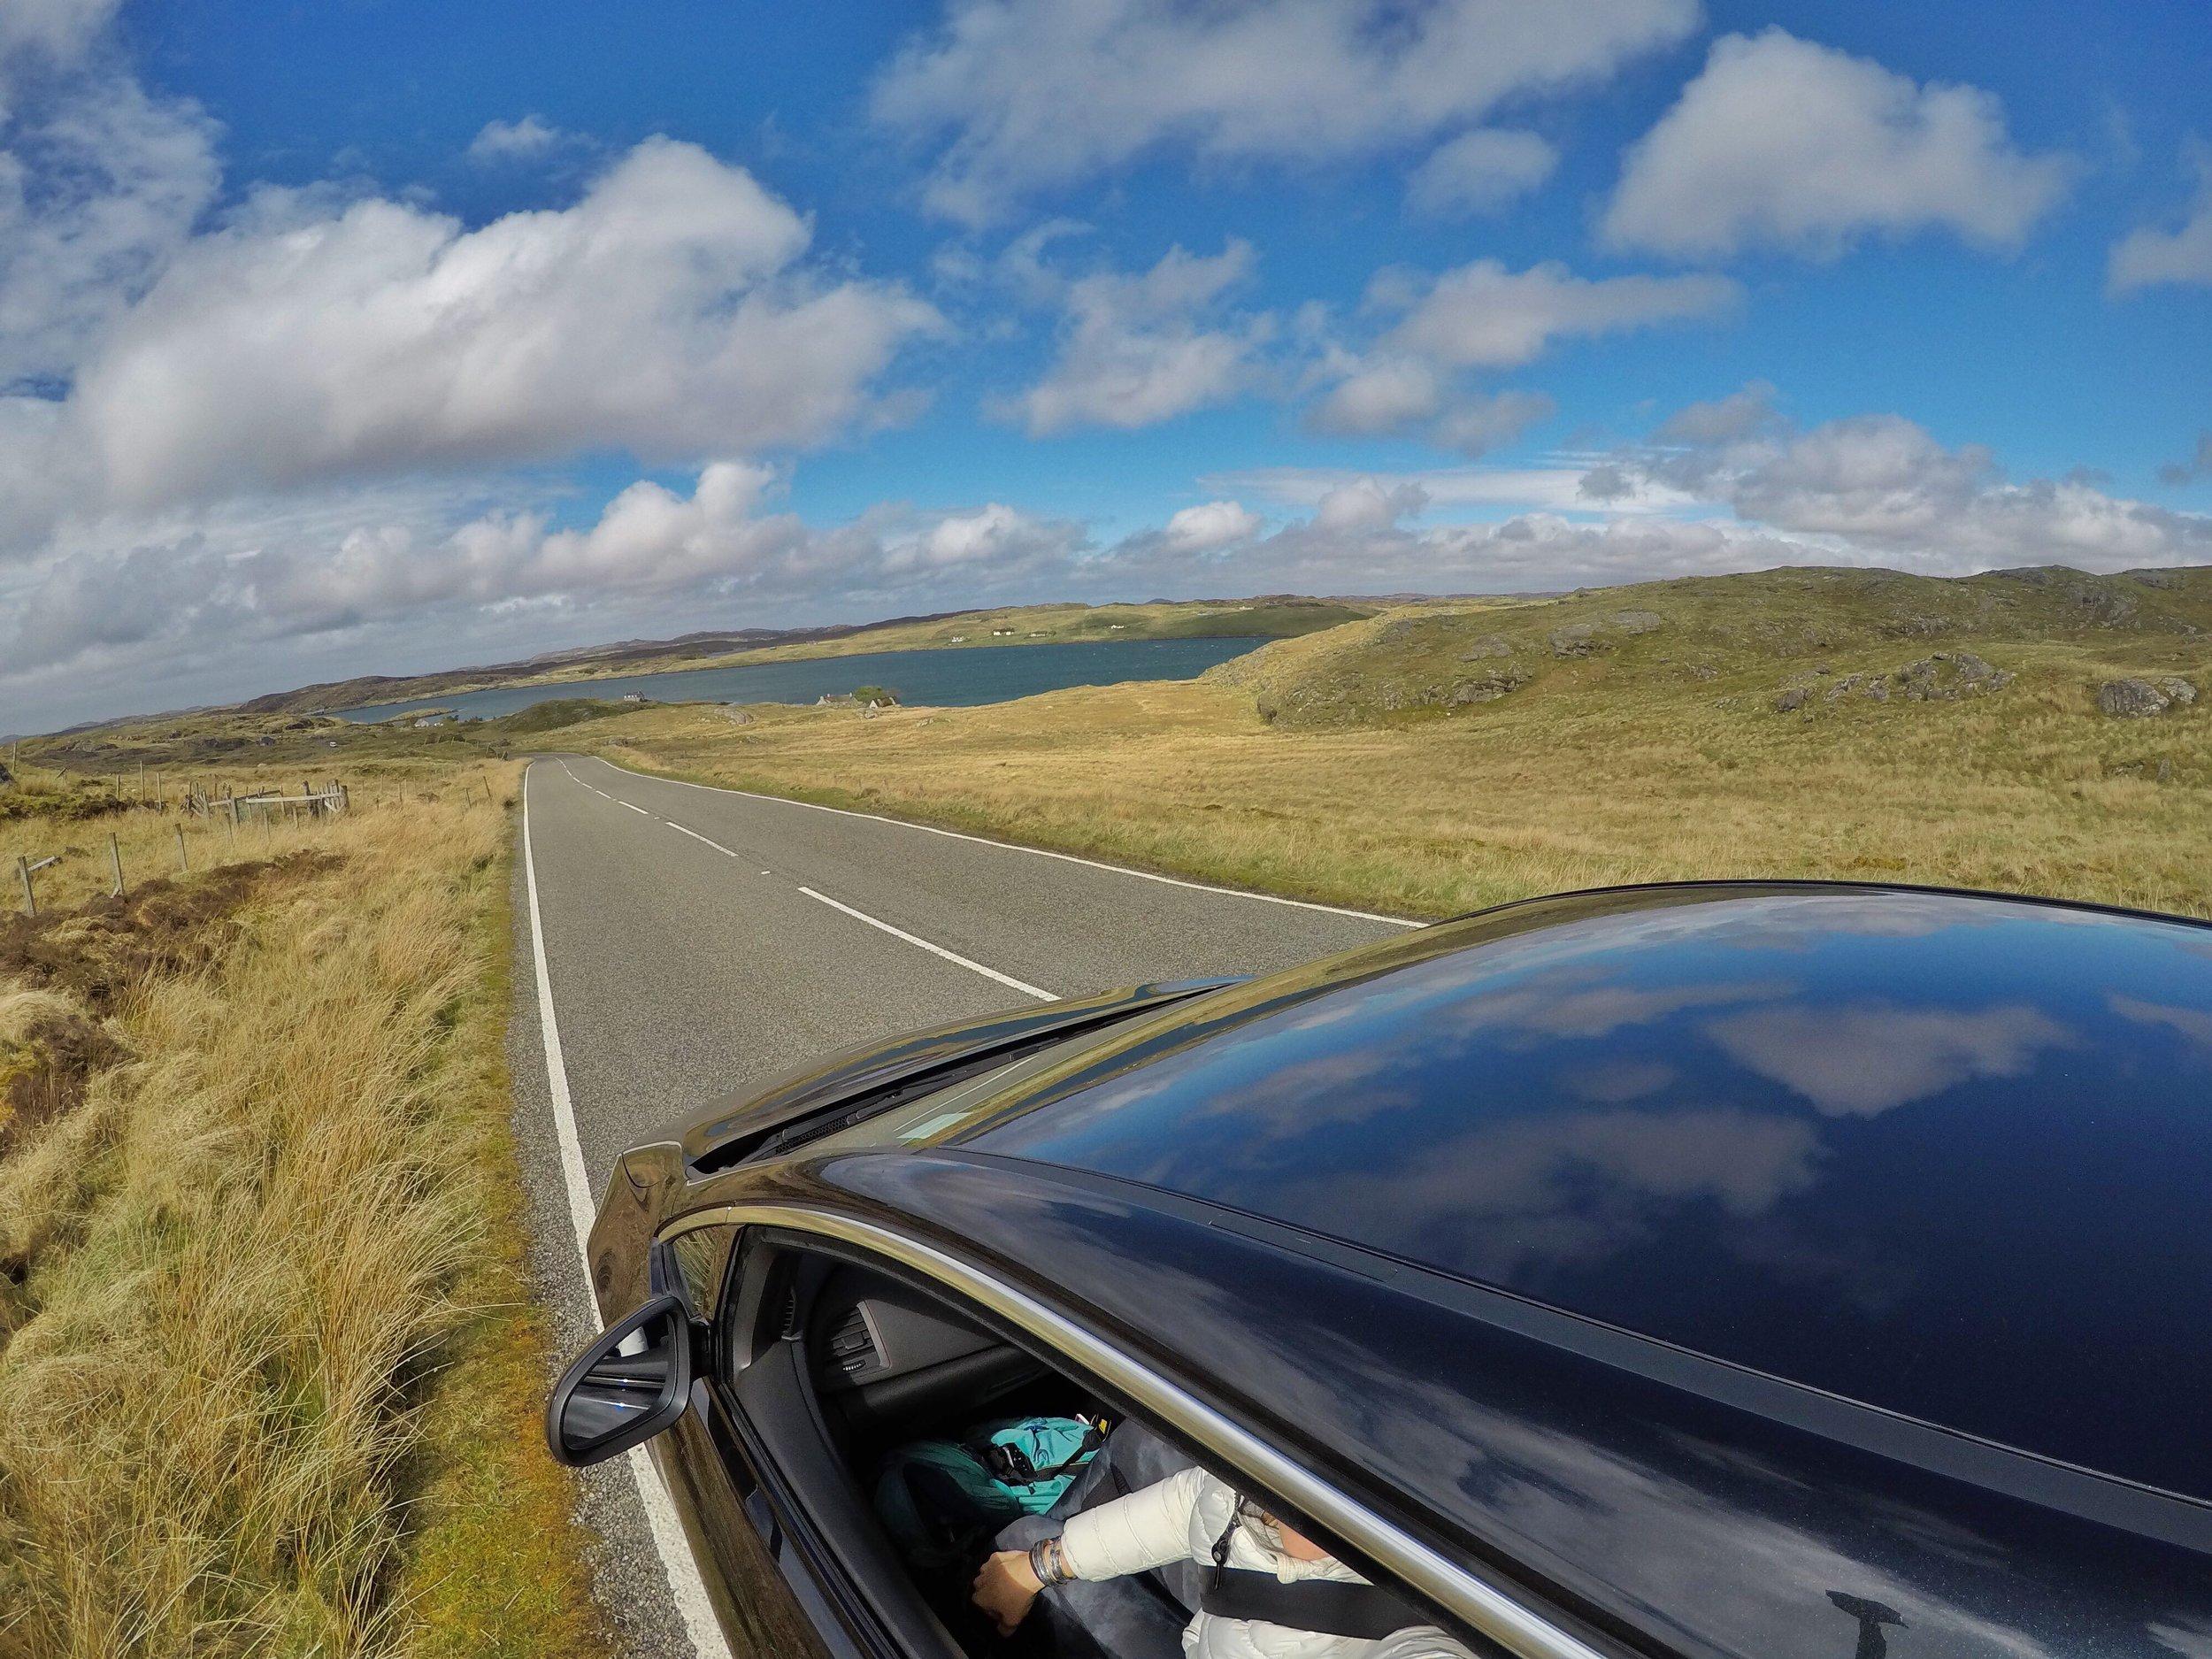 Road Trip Outer hebrides adventure, Challenge Sophie